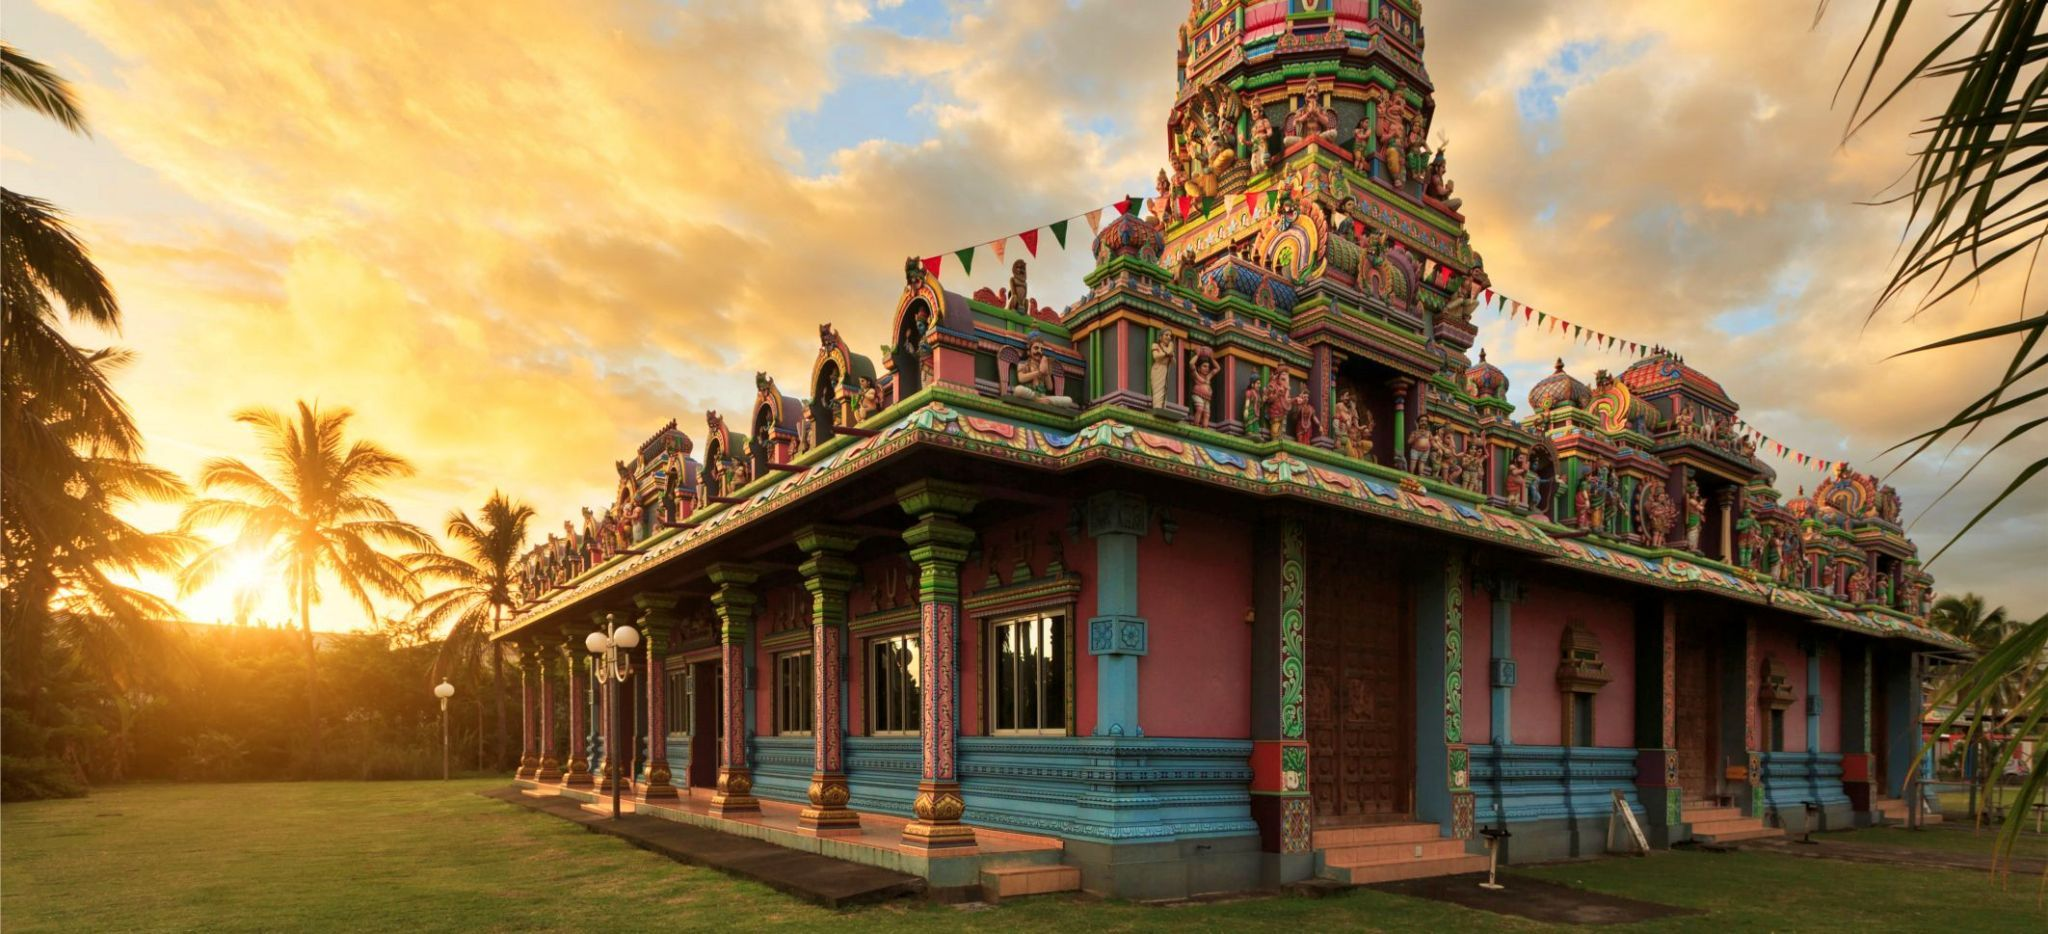 Hinduistischer Tempel auf La Réunion